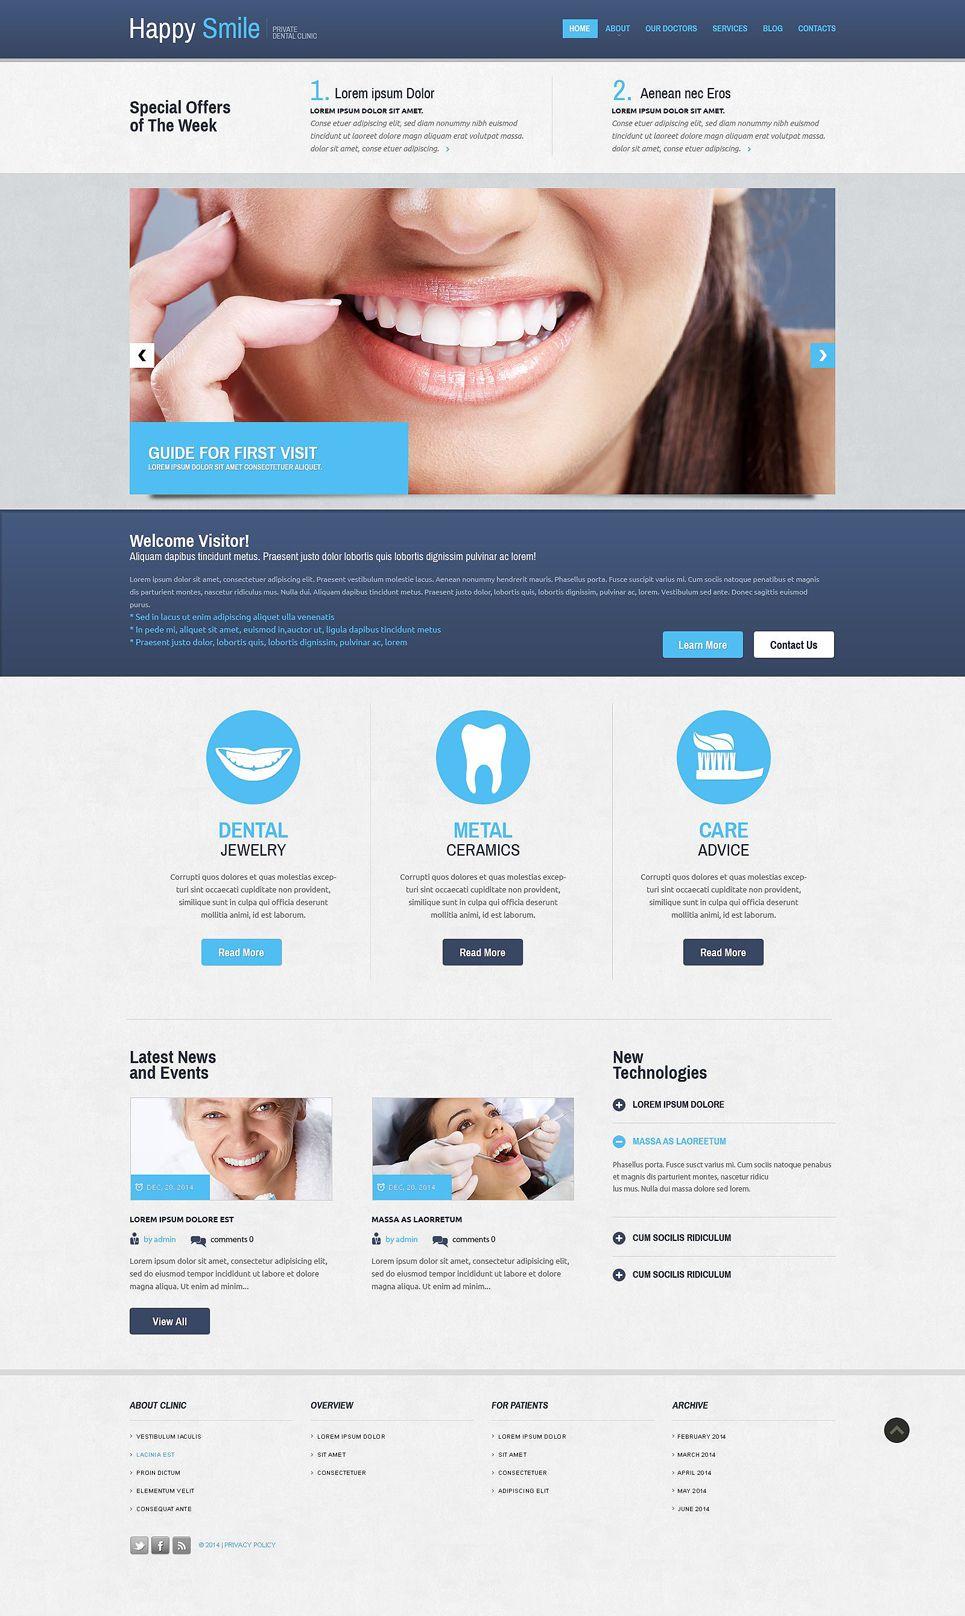 Dentistry Responsive Website Template 52394 Dentistry Responsive Website Template Business Website Design Templates